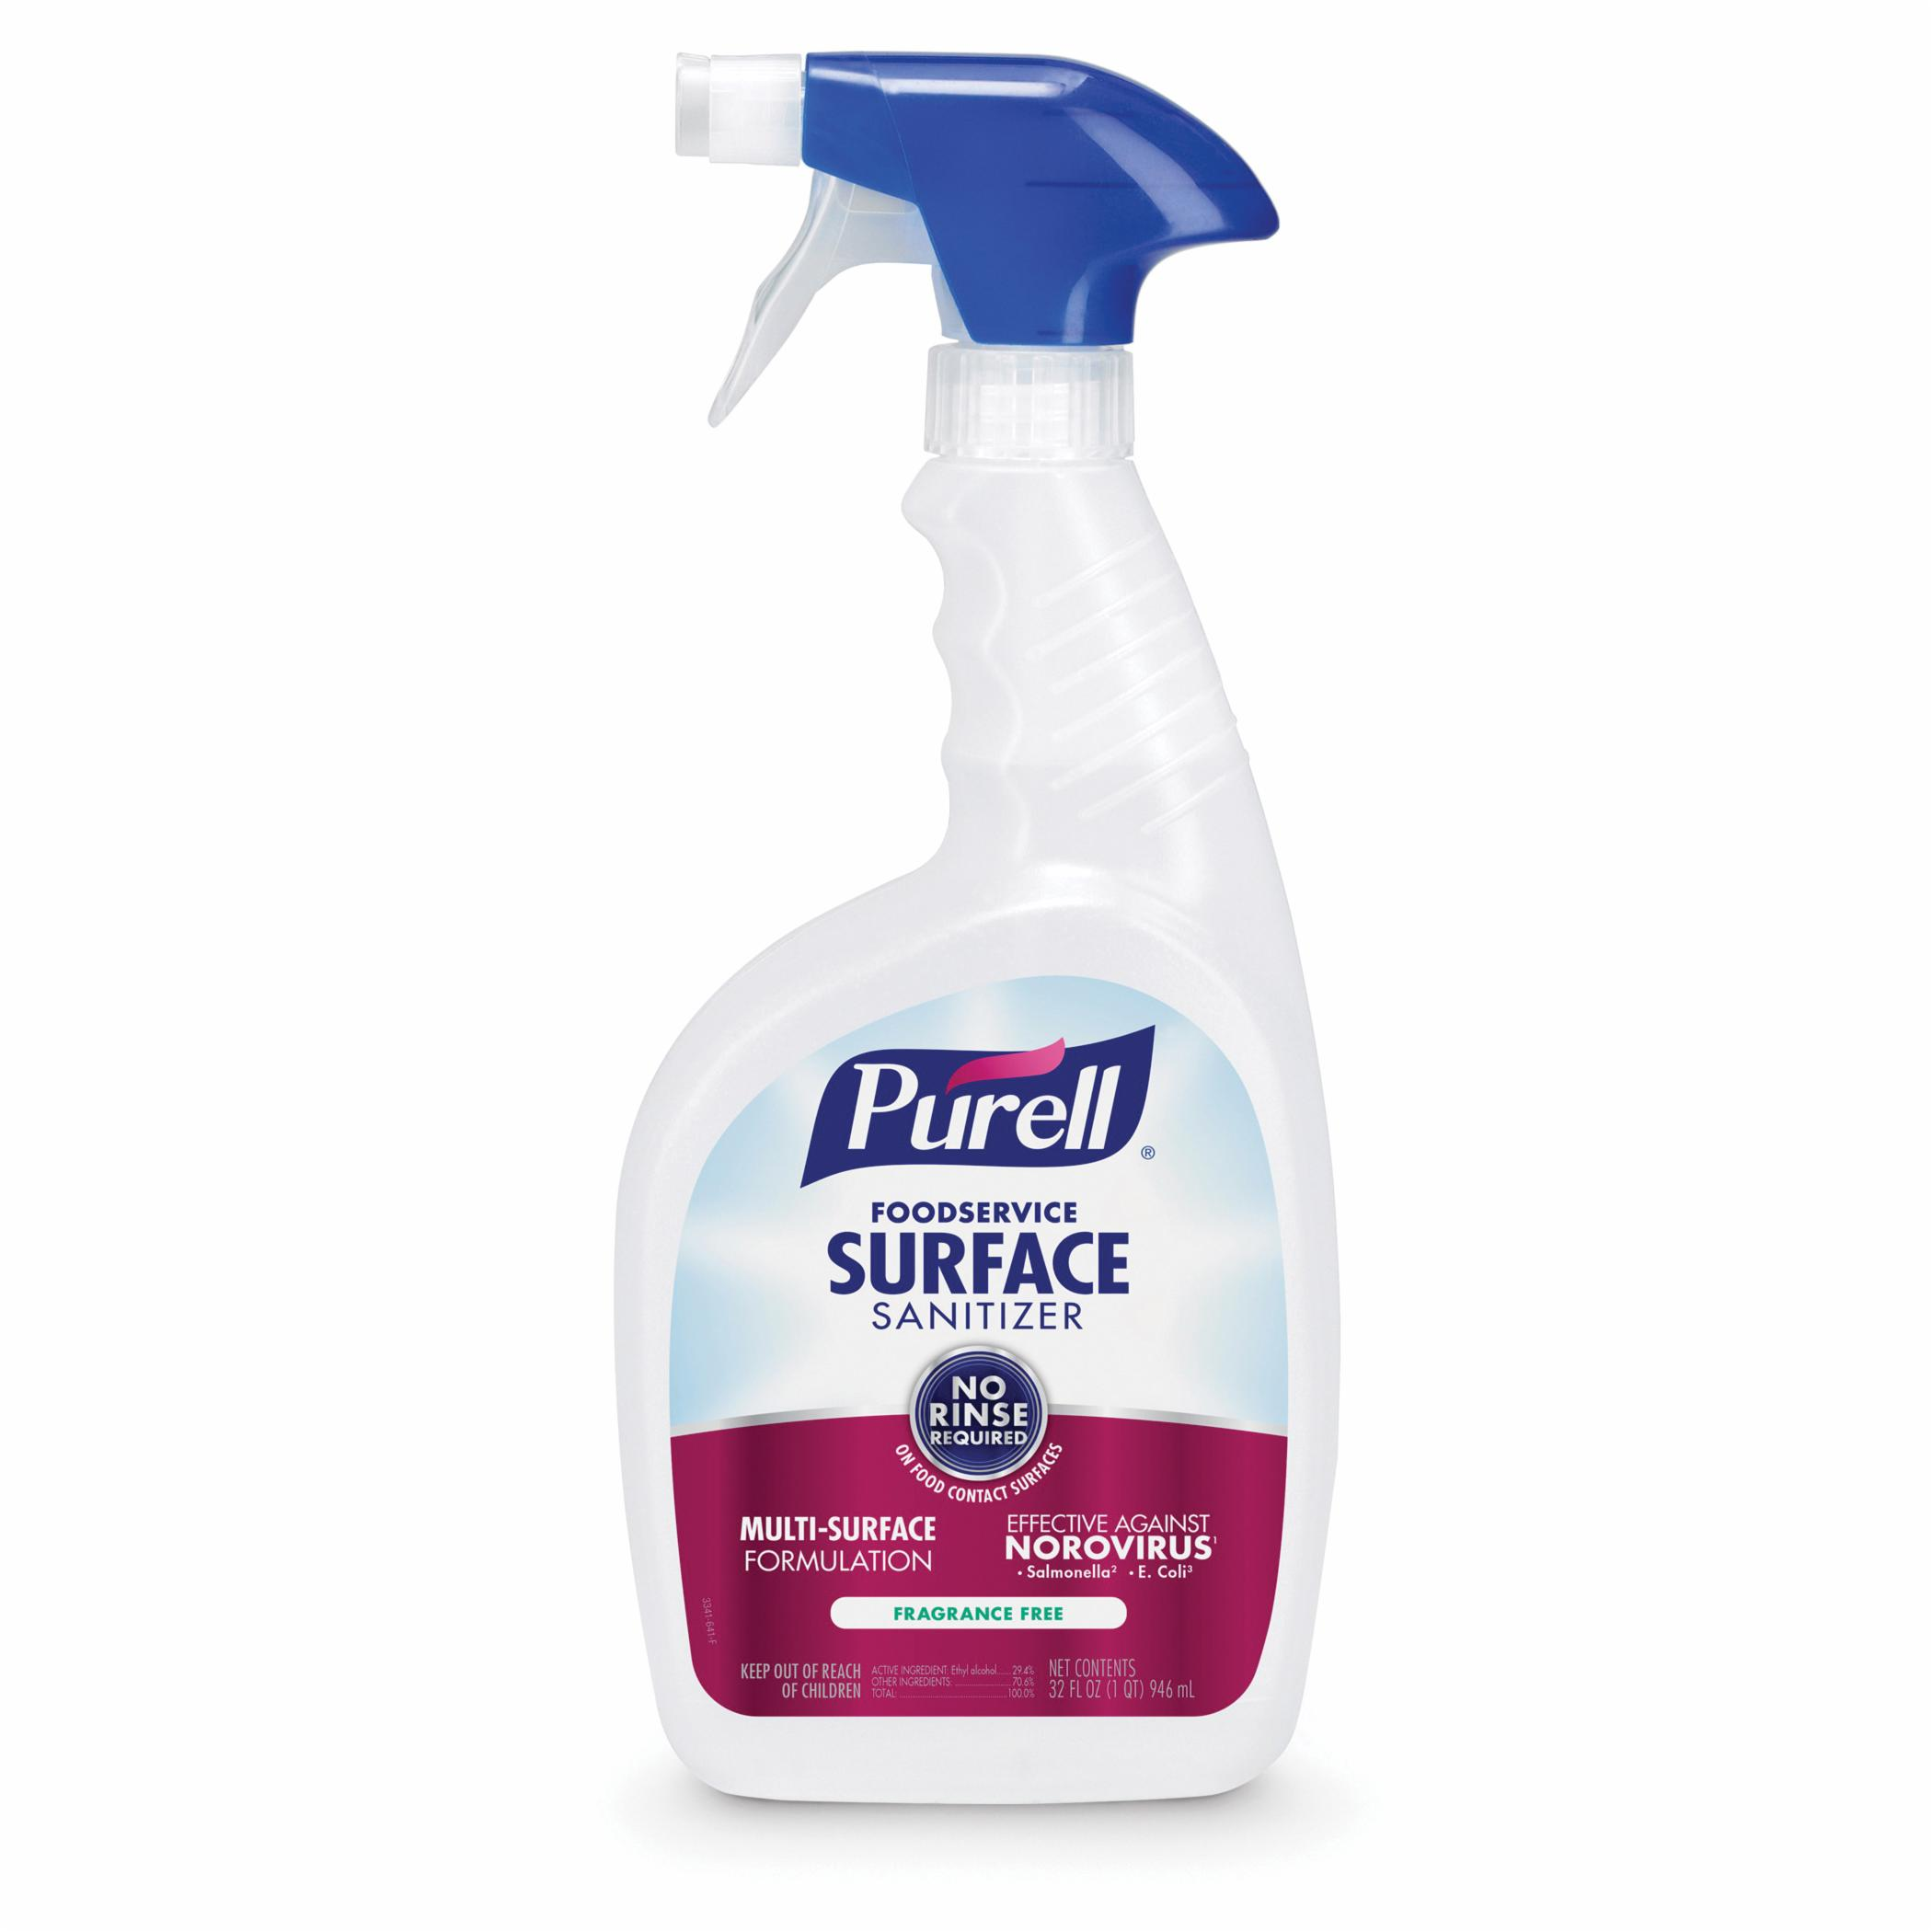 PURELL® 3341-06 Surface Sanitizer, 32 fl-oz Spray Bottle, 12.6 to 12.9, Liquid, Fragrance Free